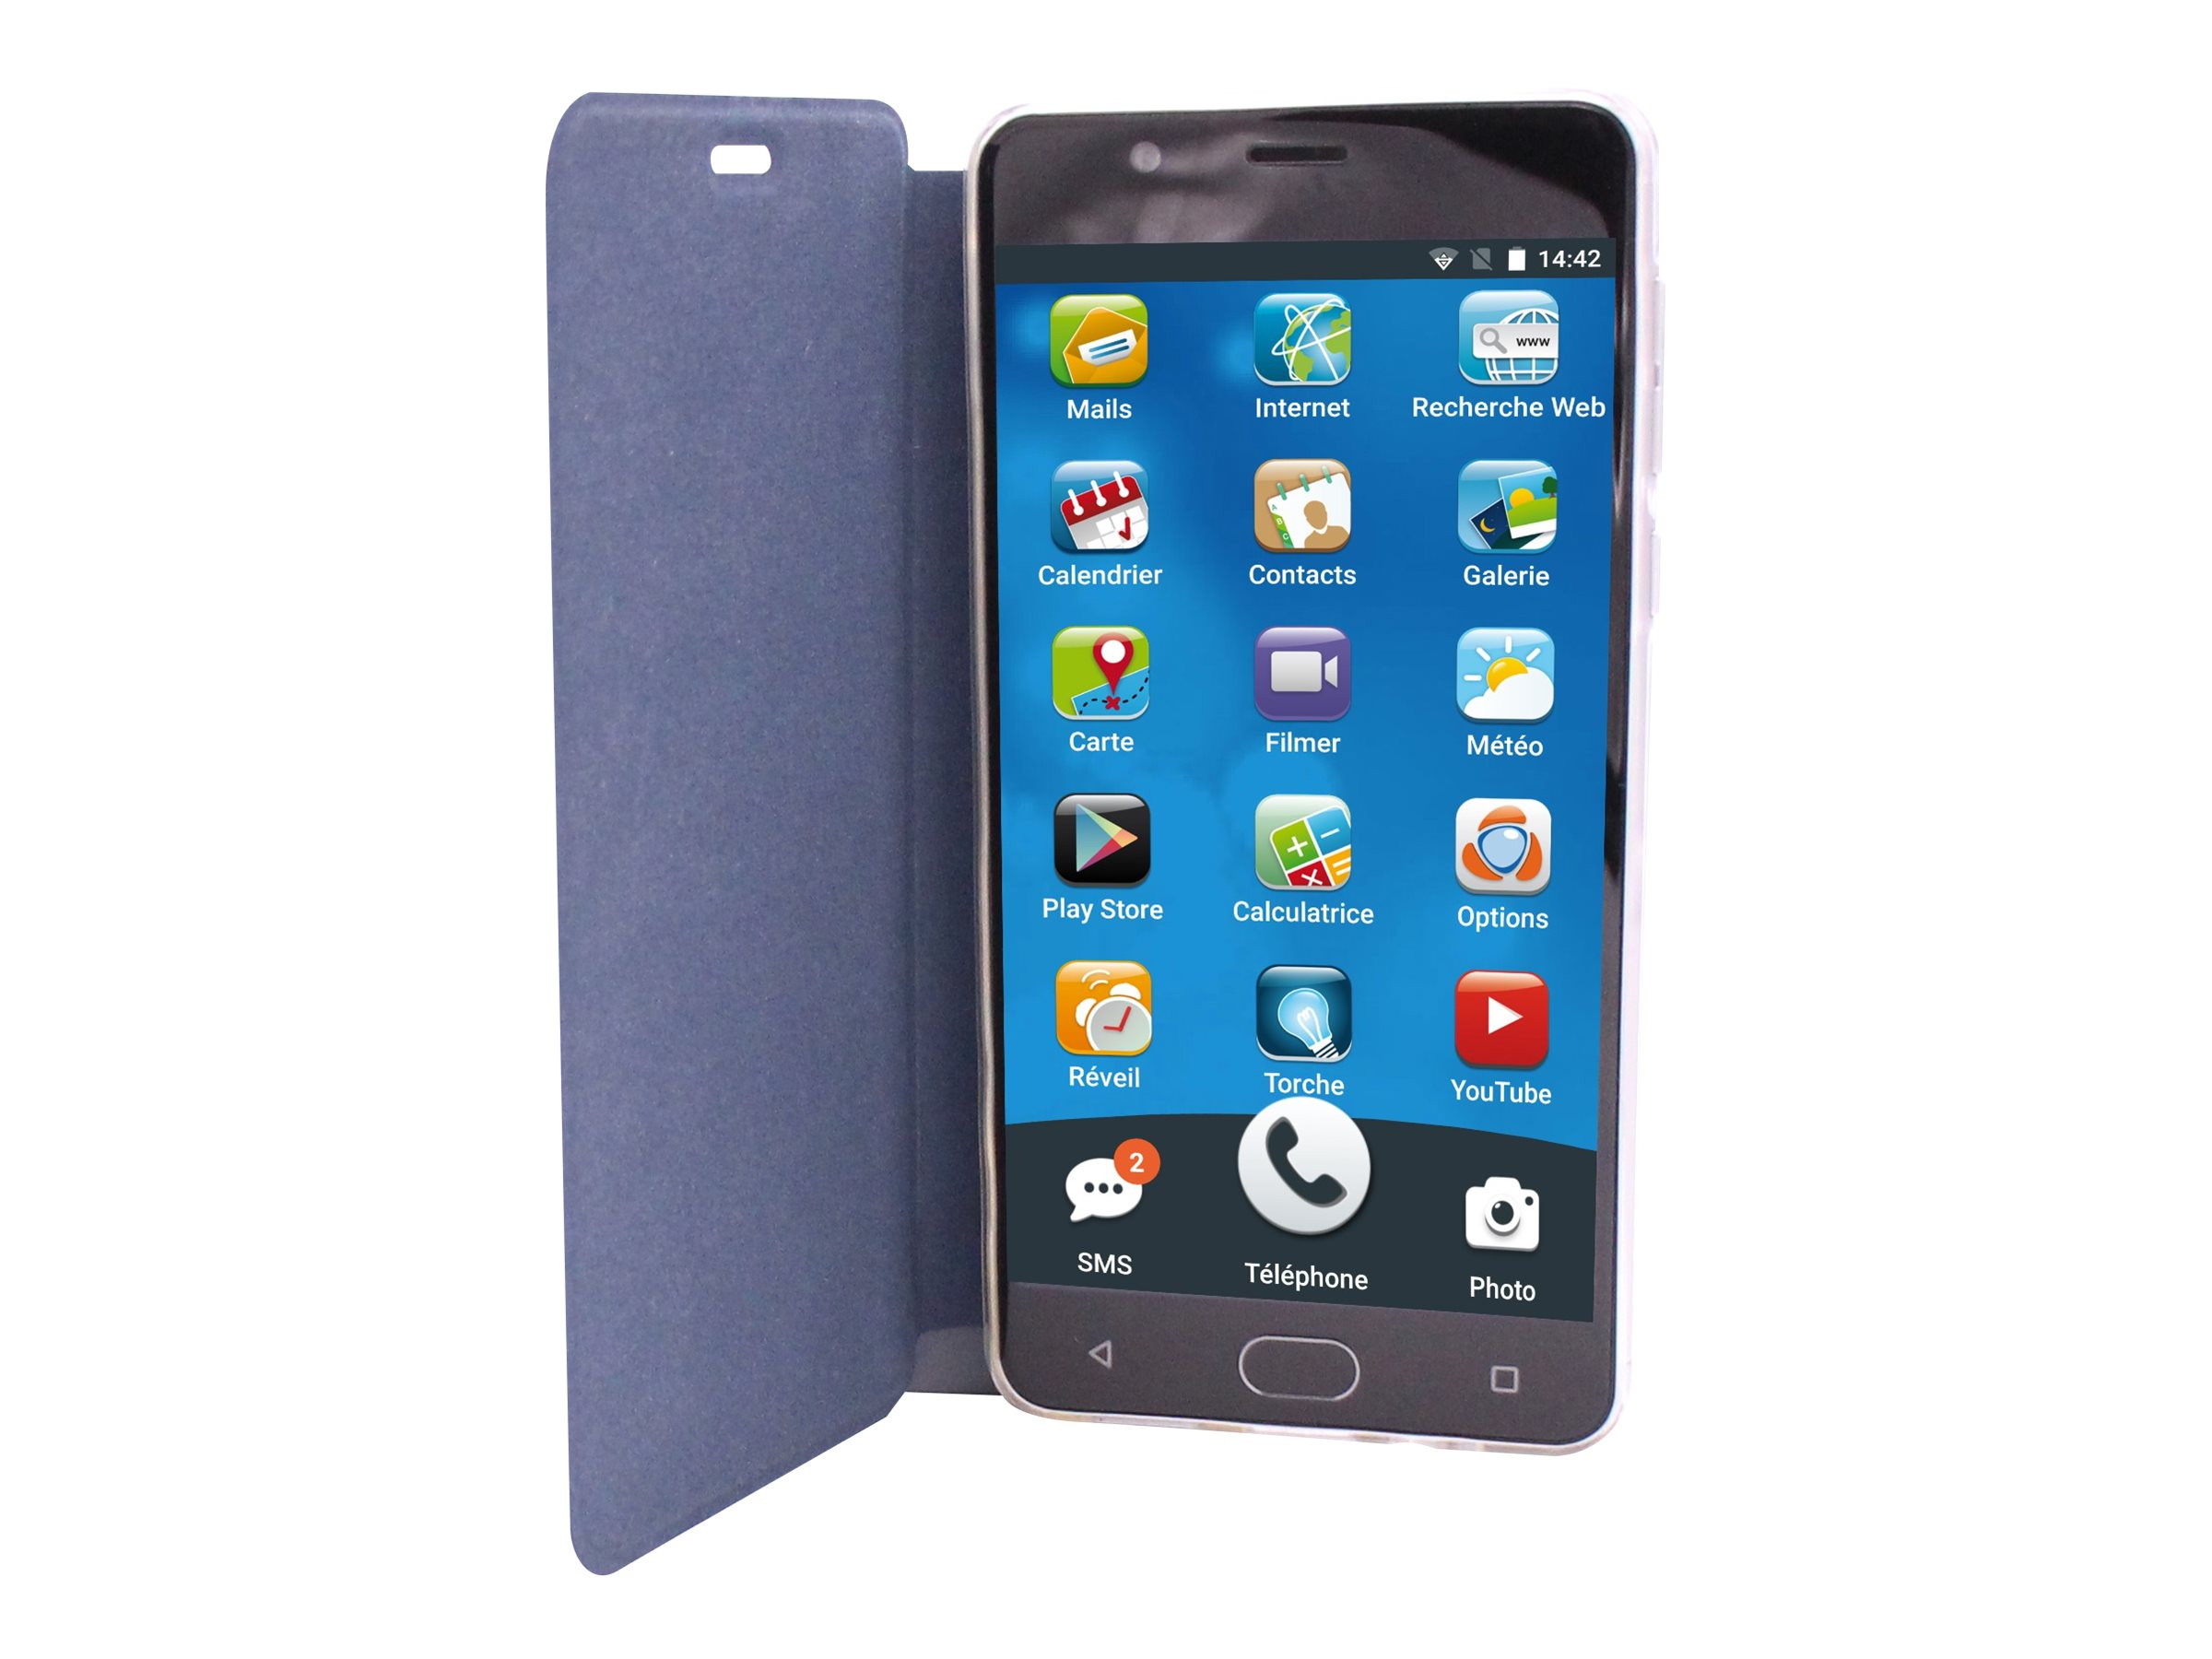 Ordissimo Flip-Hülle für Mobiltelefon - Echt Leder